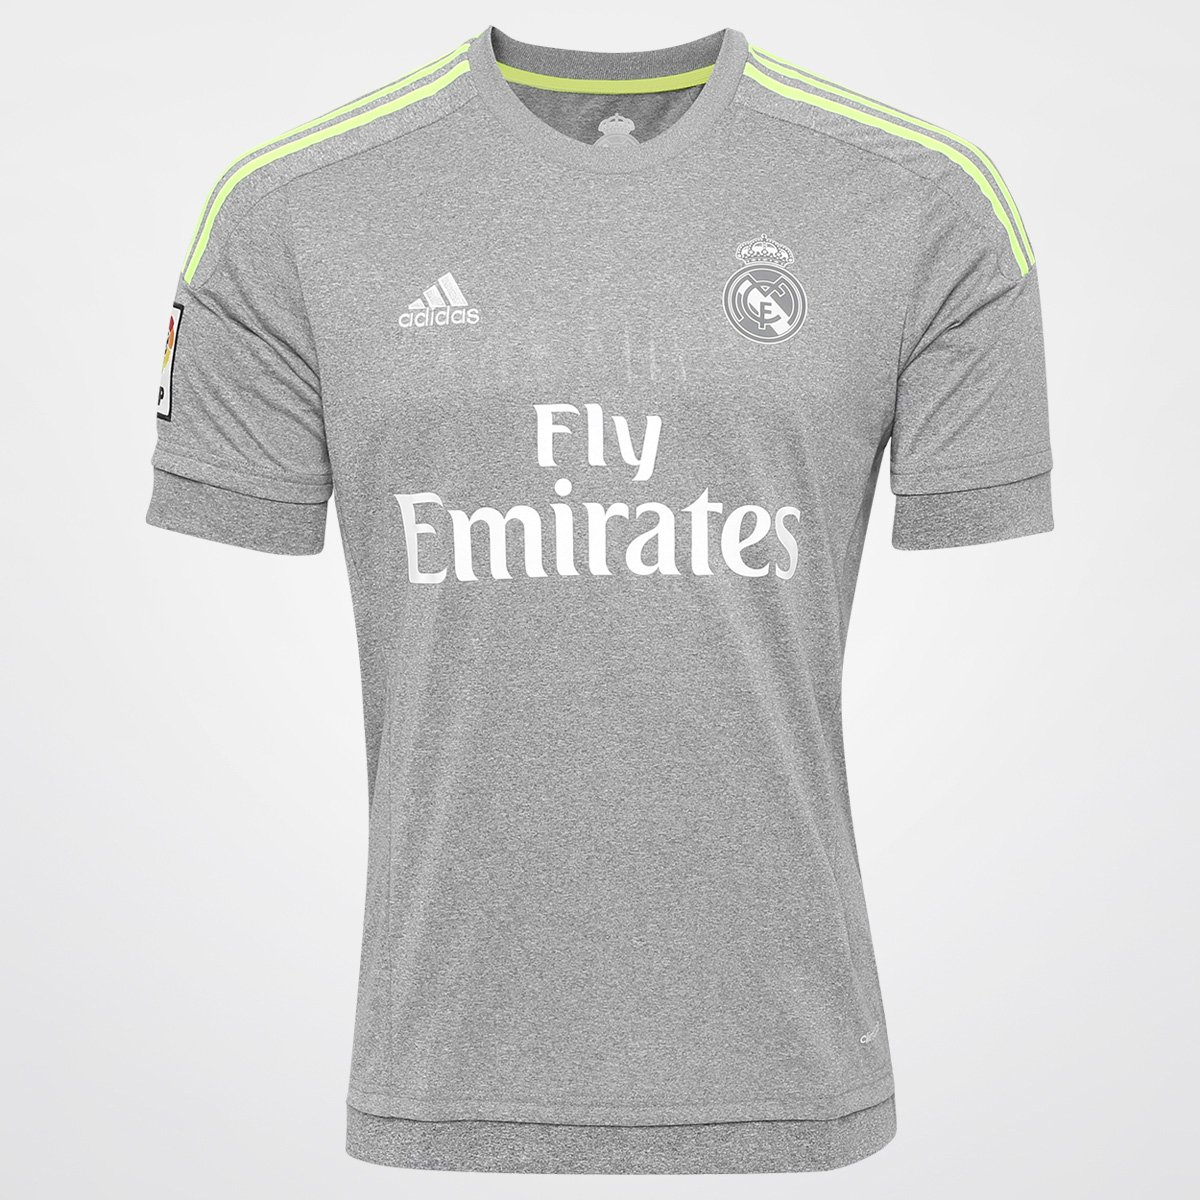 Camisa Adidas Real Madrid Away 15 16 s nº - Compre Agora  9835b4955b9